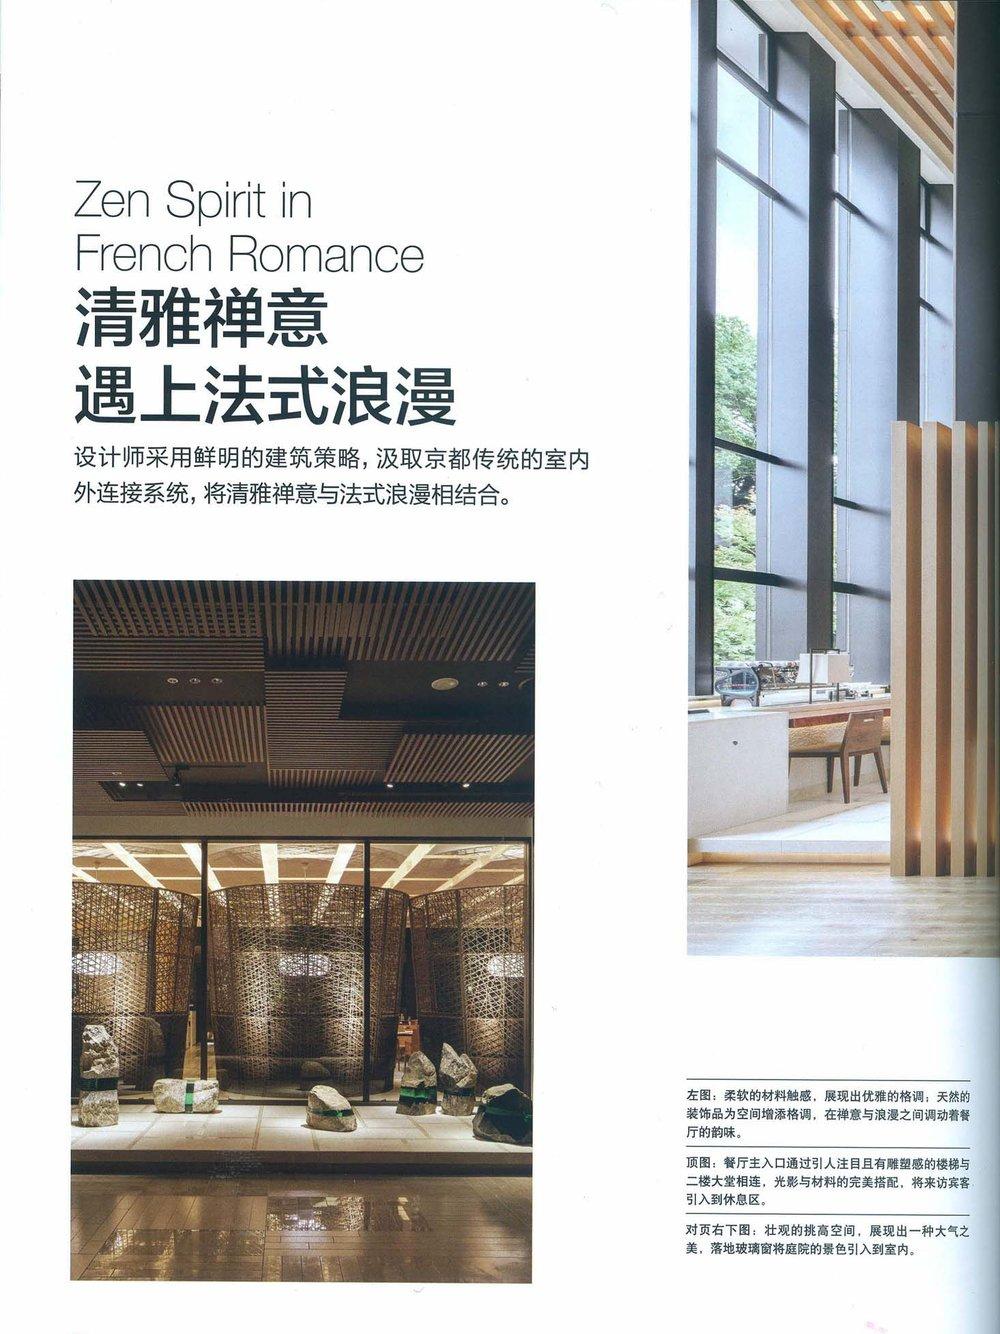 Trends | June 2017 - Brasserie at Four Seasons Hotel Kyoto |Kokaistudios